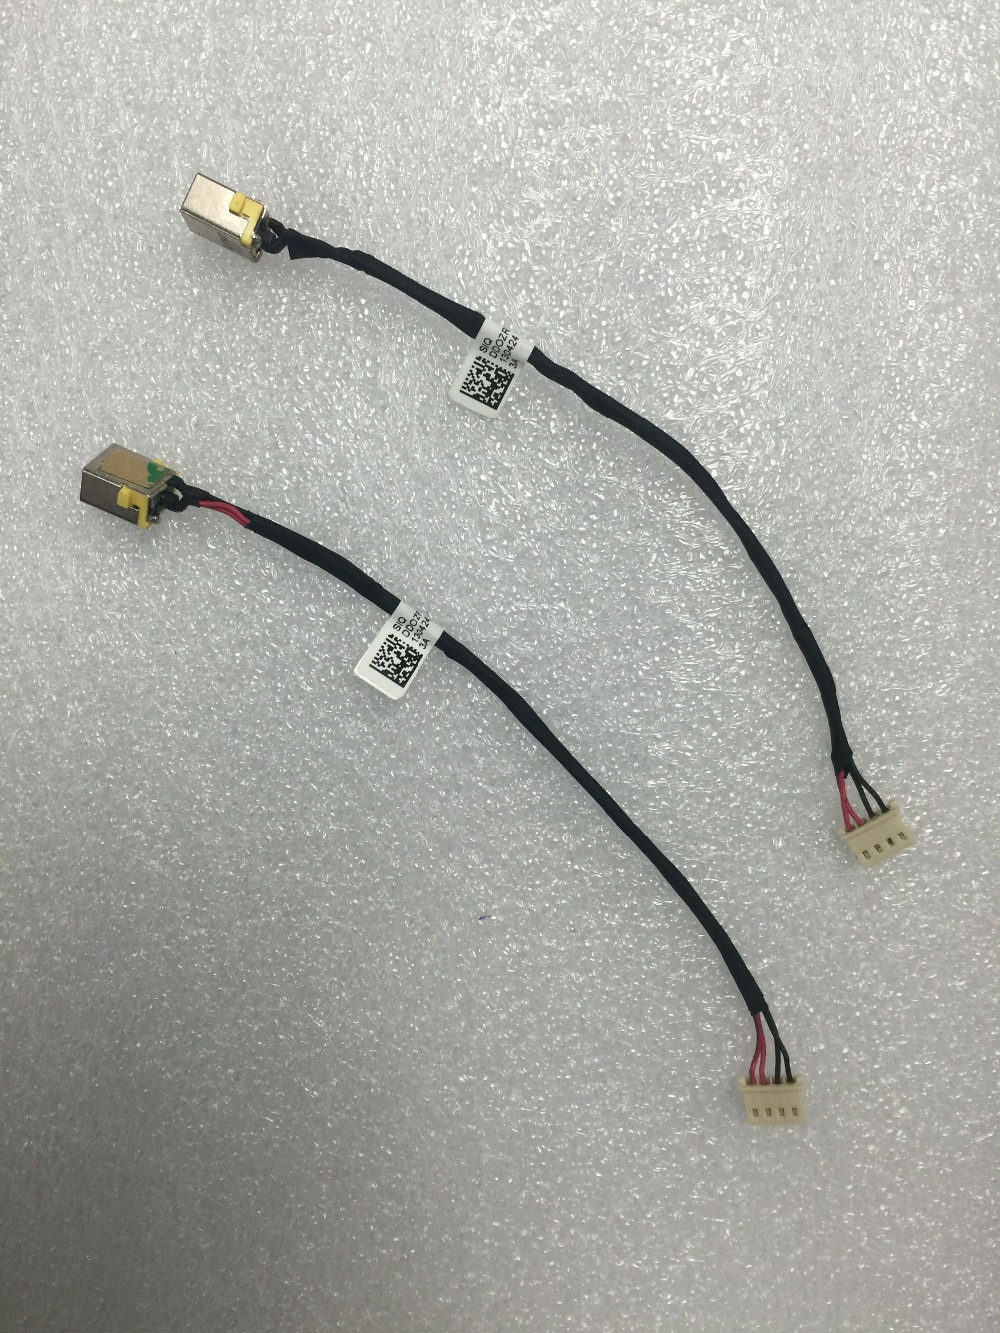 Nueva computadora portátil Jack de alimentación DC con cable para Acer Aspire V5-573 V5-573G V5-573P V5-573PG DC Jack